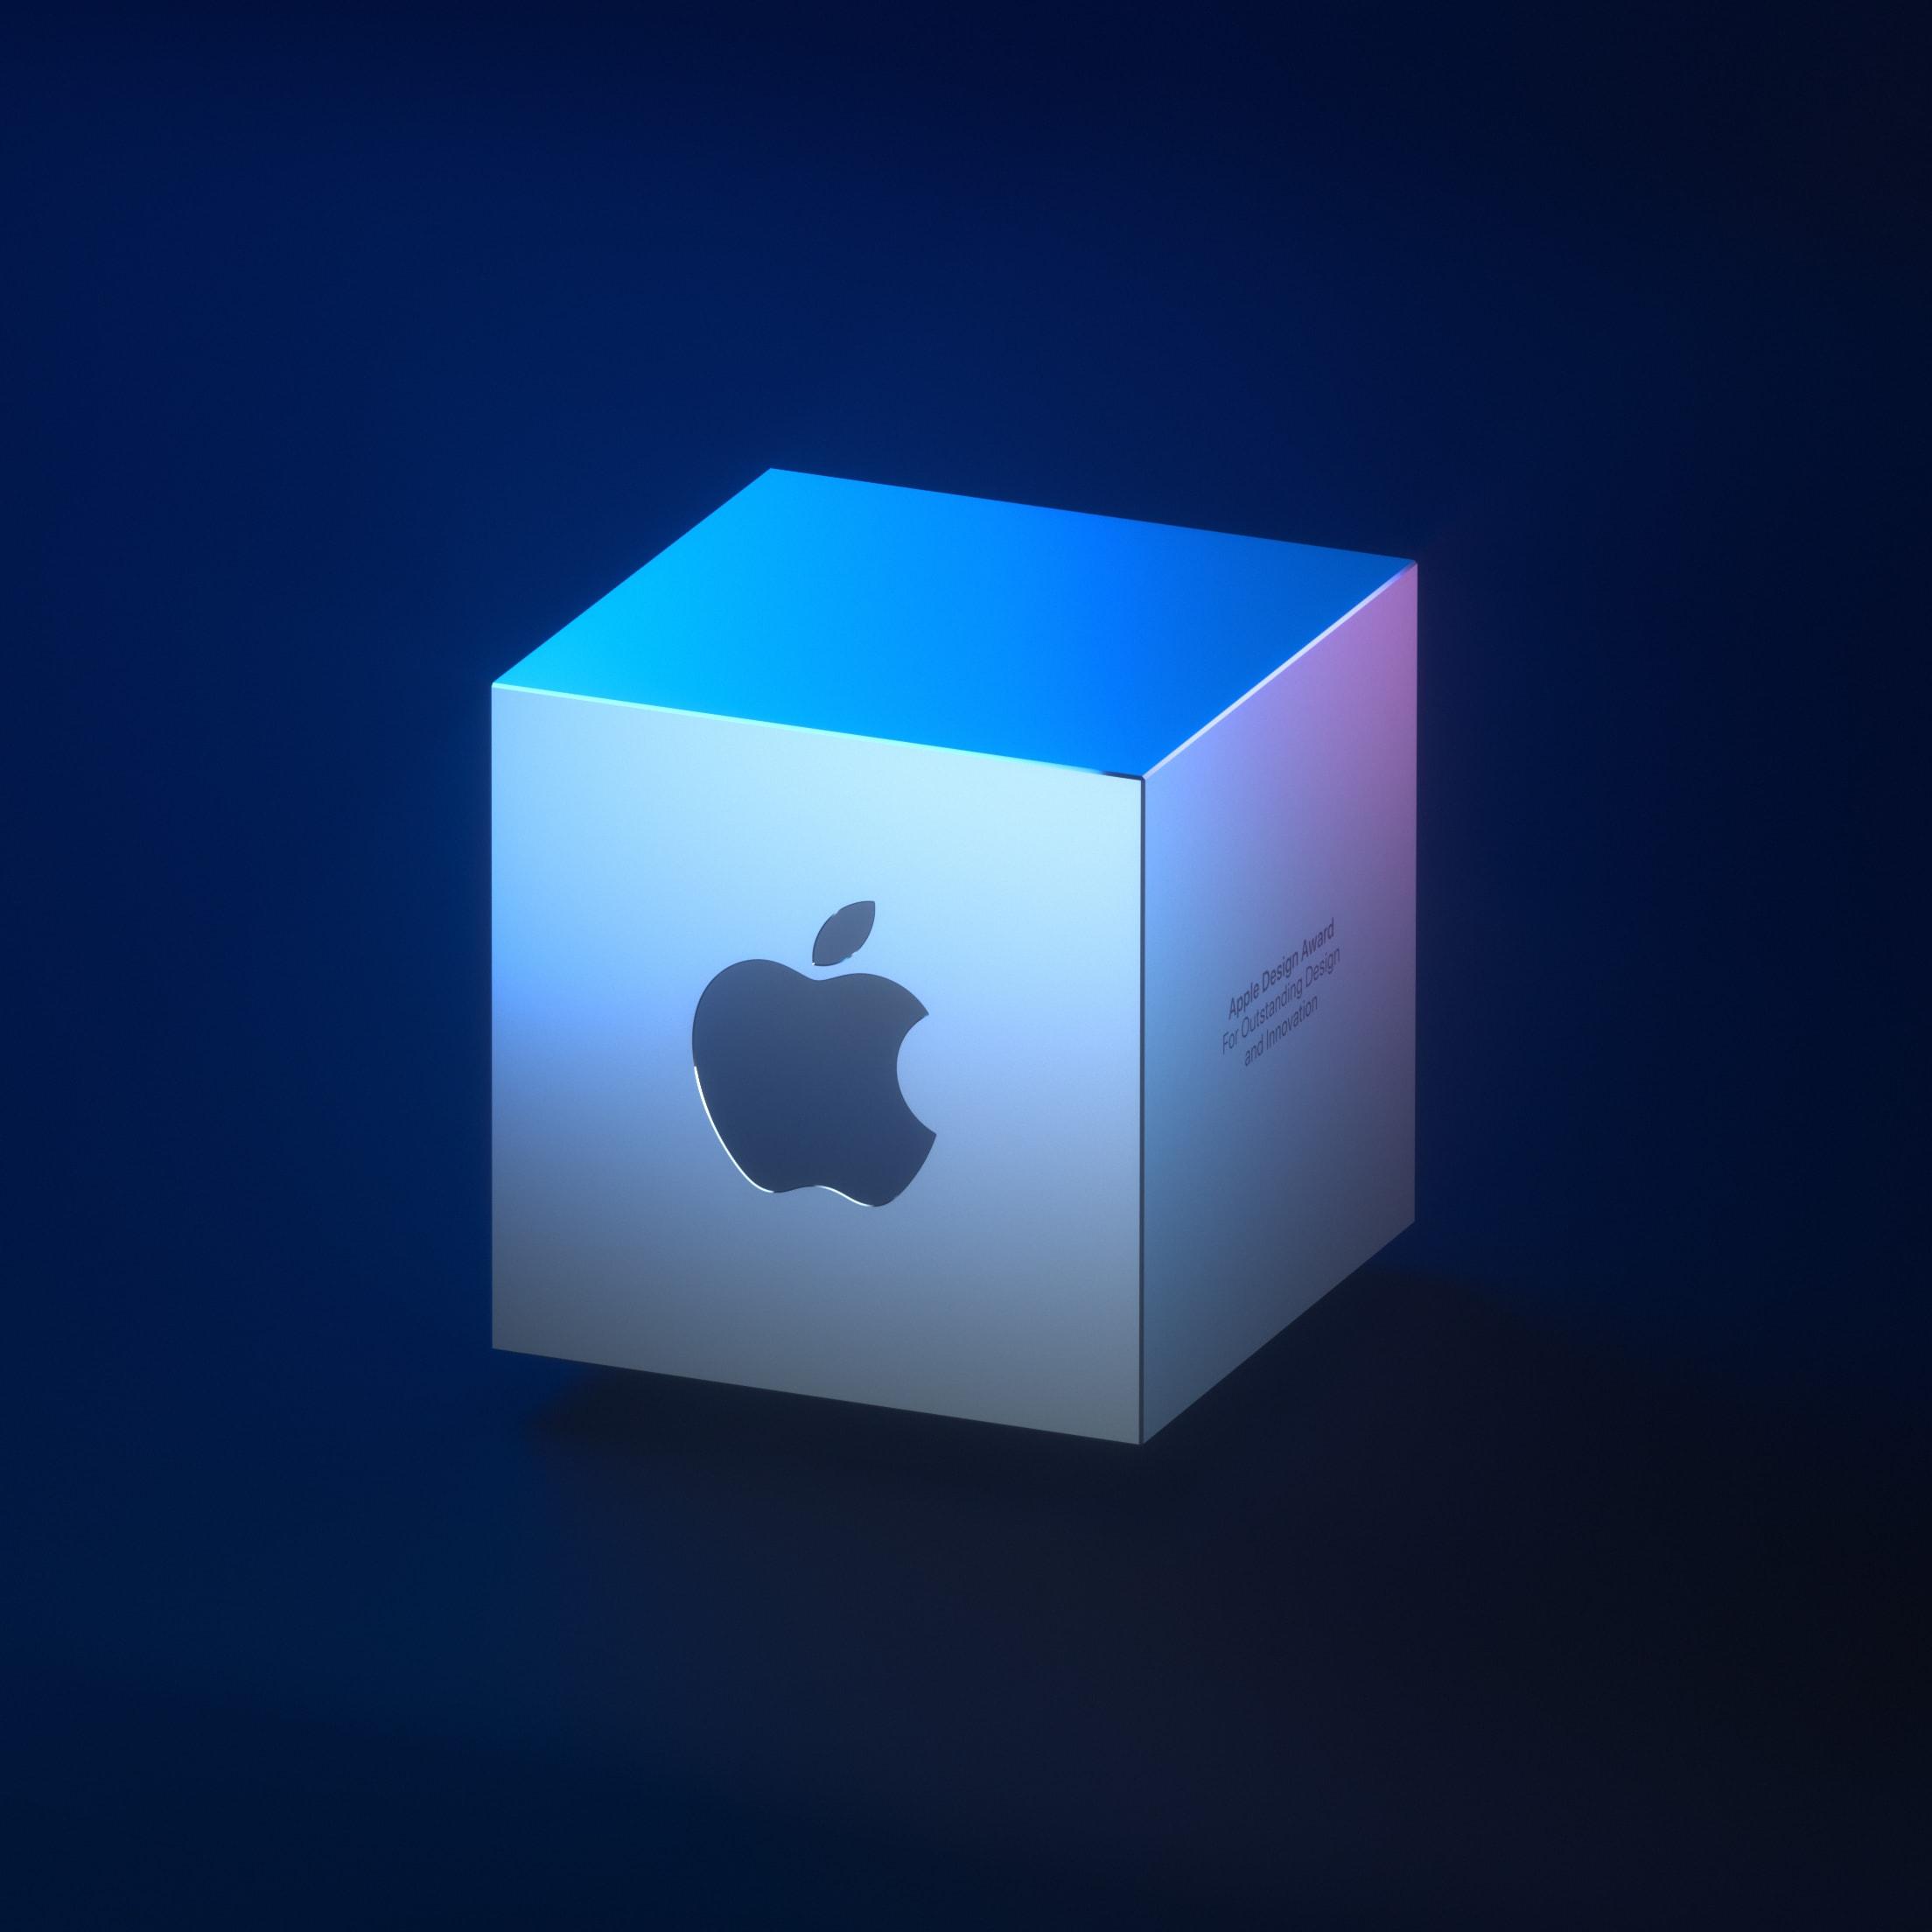 Cubo dos Apple Design Awards 2019 na WWDC